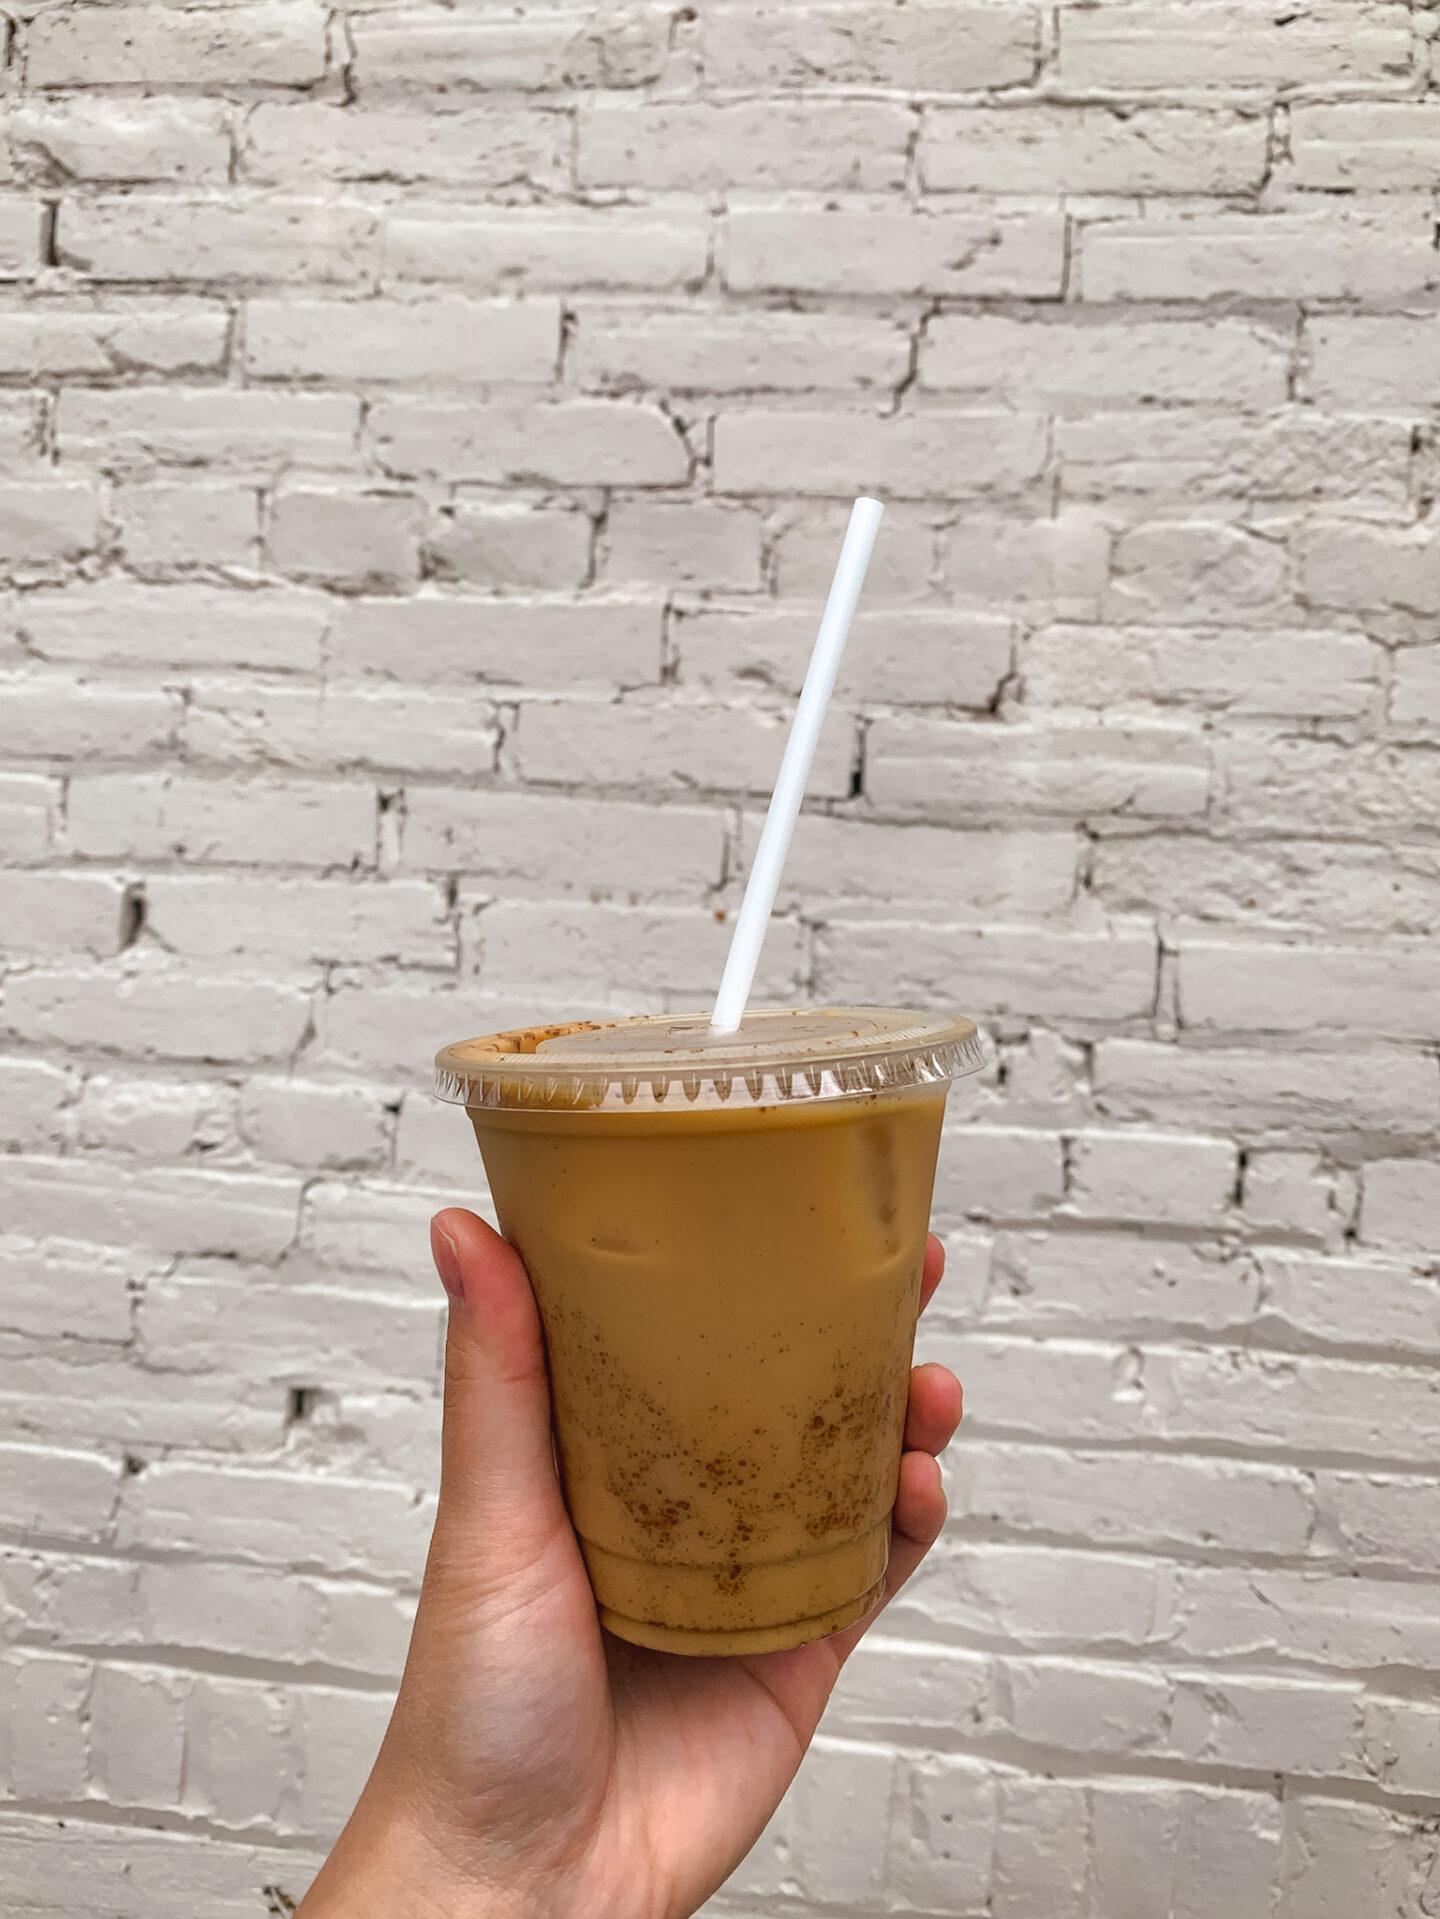 Roam Coffee in Bowmanville, Ontario